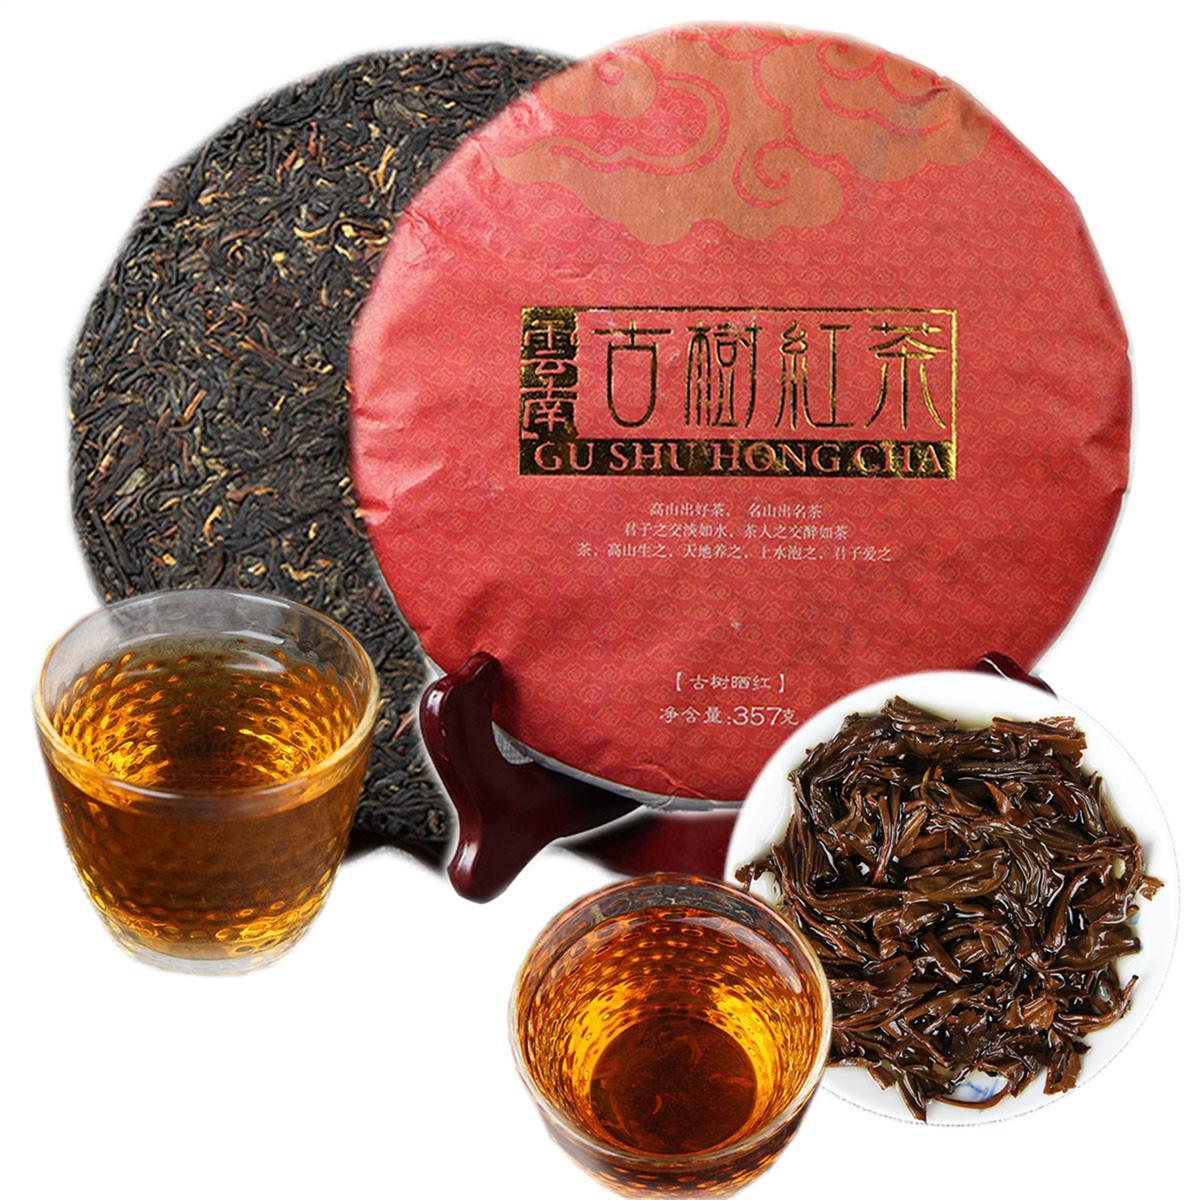 Promoção 357g Yunnan Árvore antiga Maduro Puer chá Bolo Organic Preto Natural Pu'er árvore velha chá cozido Puer chá